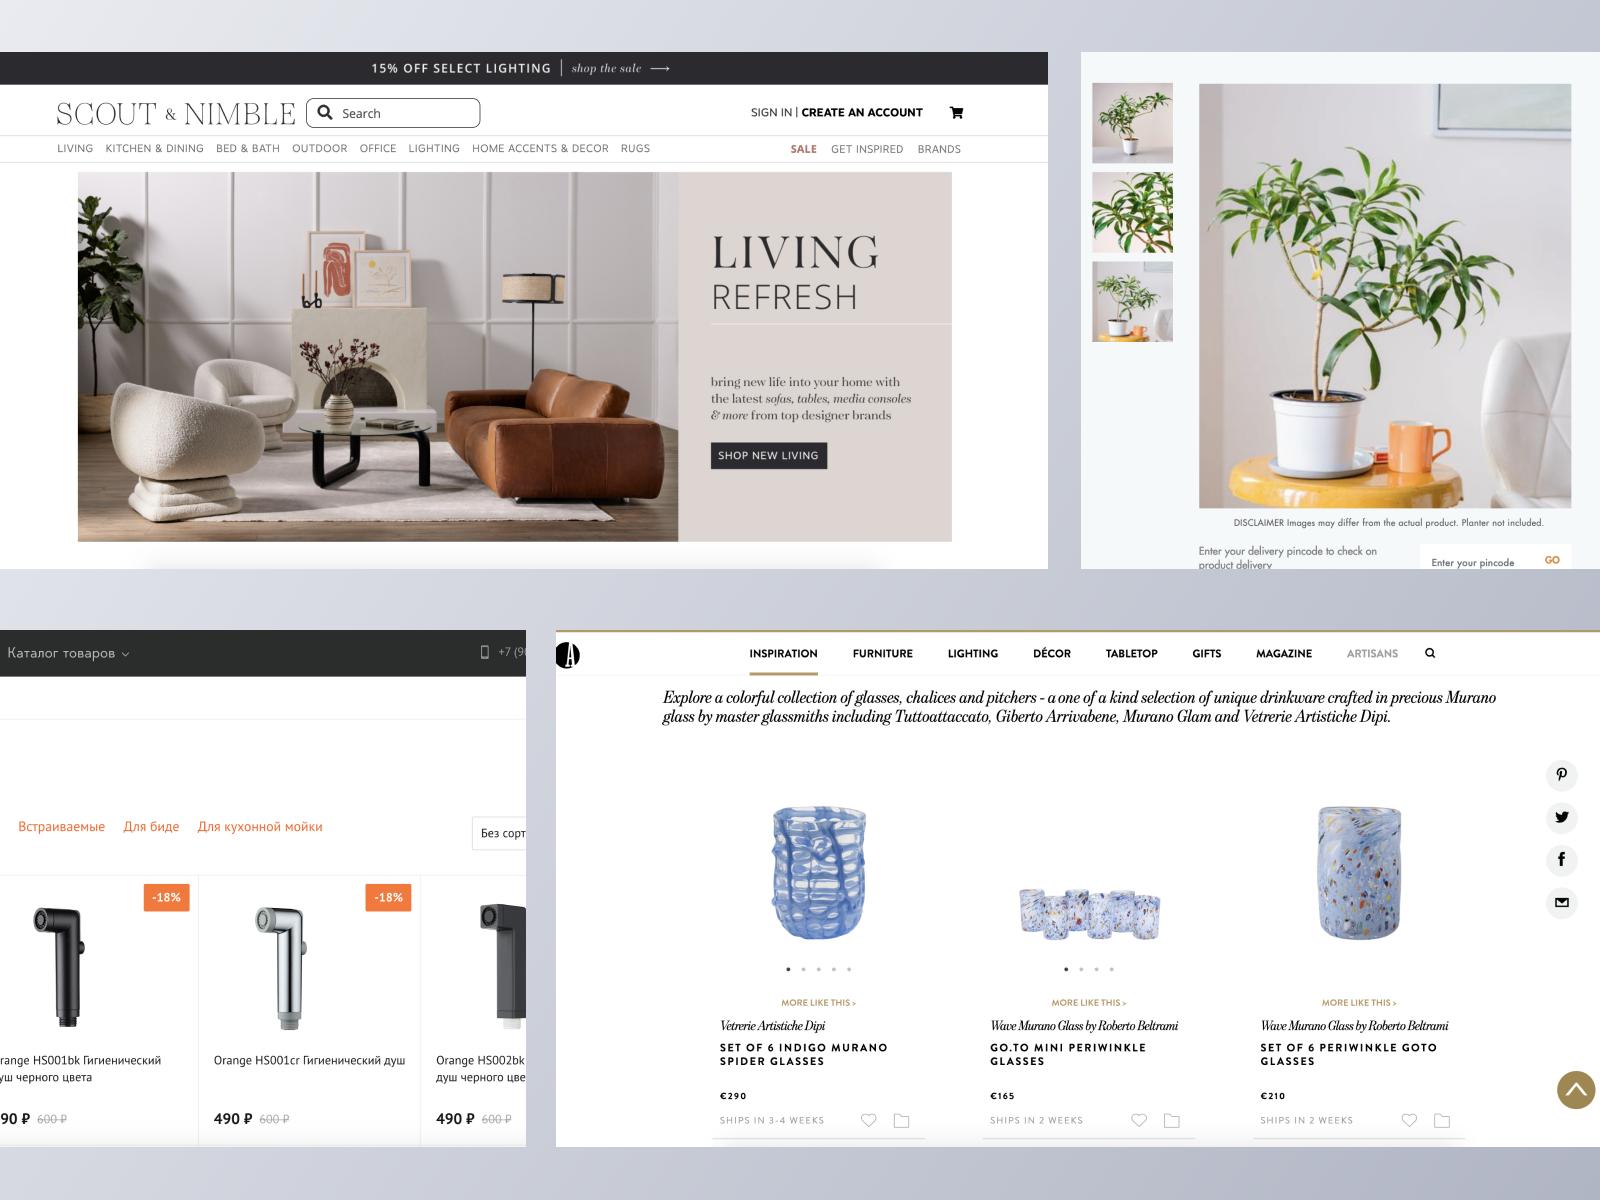 Home & Garden ecommerce websites using Spree Commerce